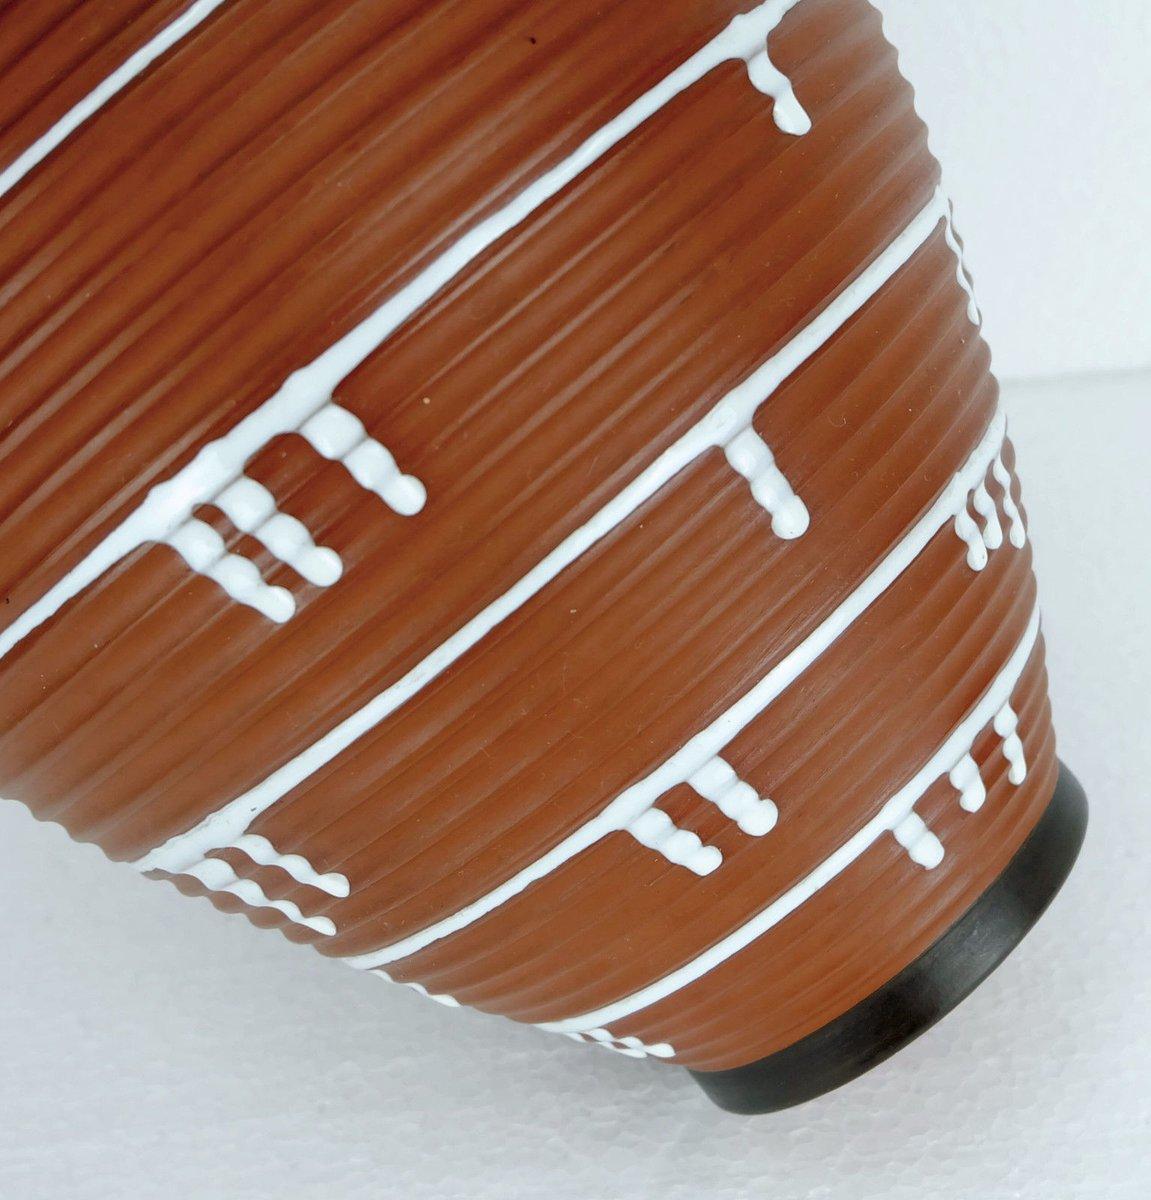 gro e vintage krugvase von ilkra keramik bei pamono kaufen. Black Bedroom Furniture Sets. Home Design Ideas